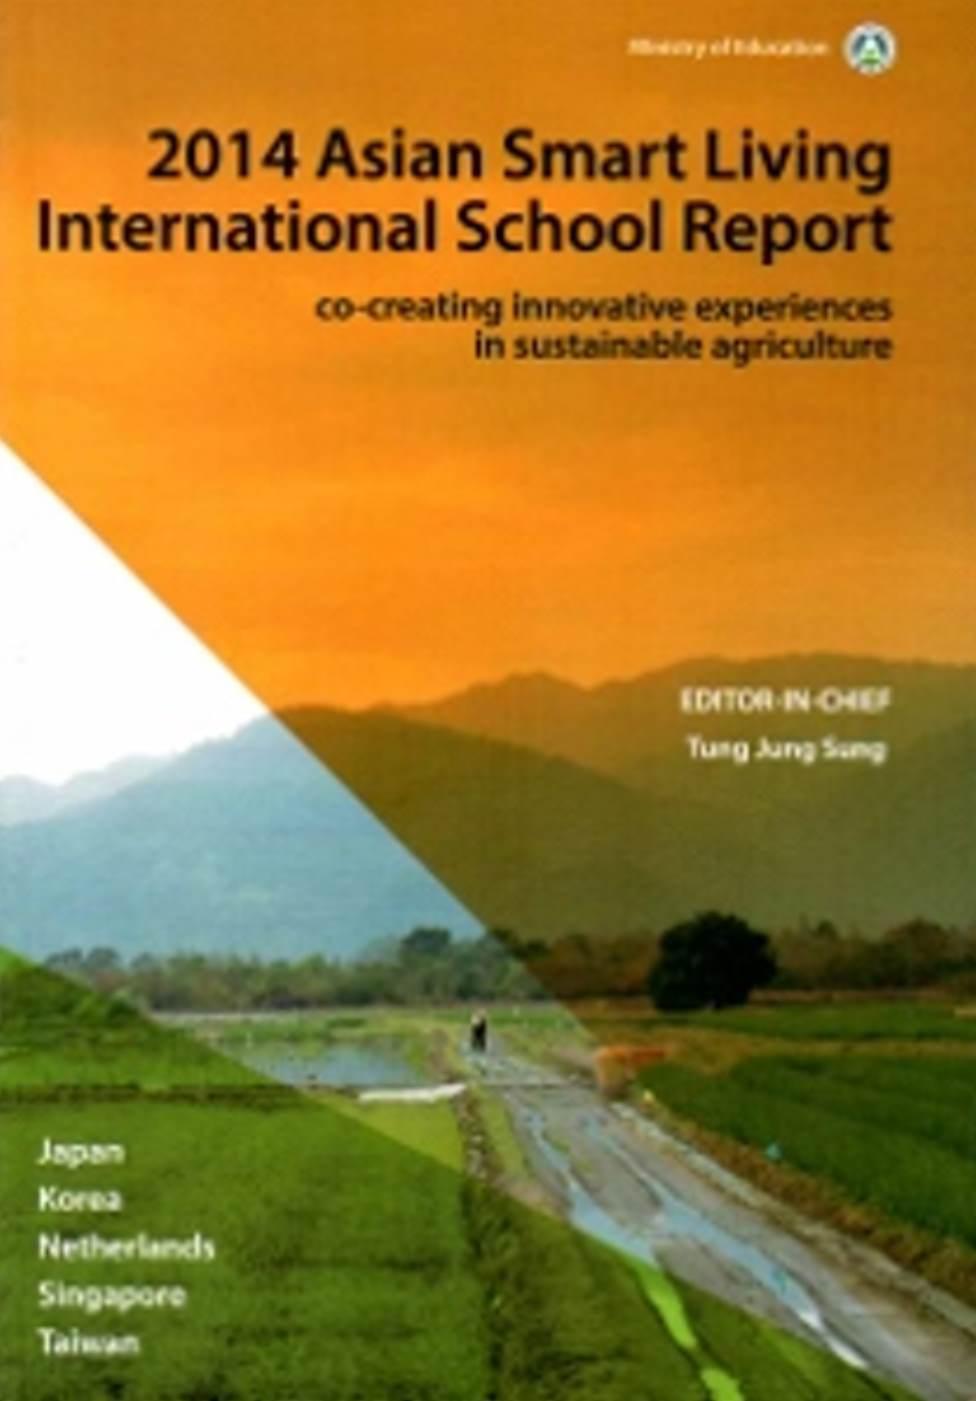 2014 Asian Smart Living International School